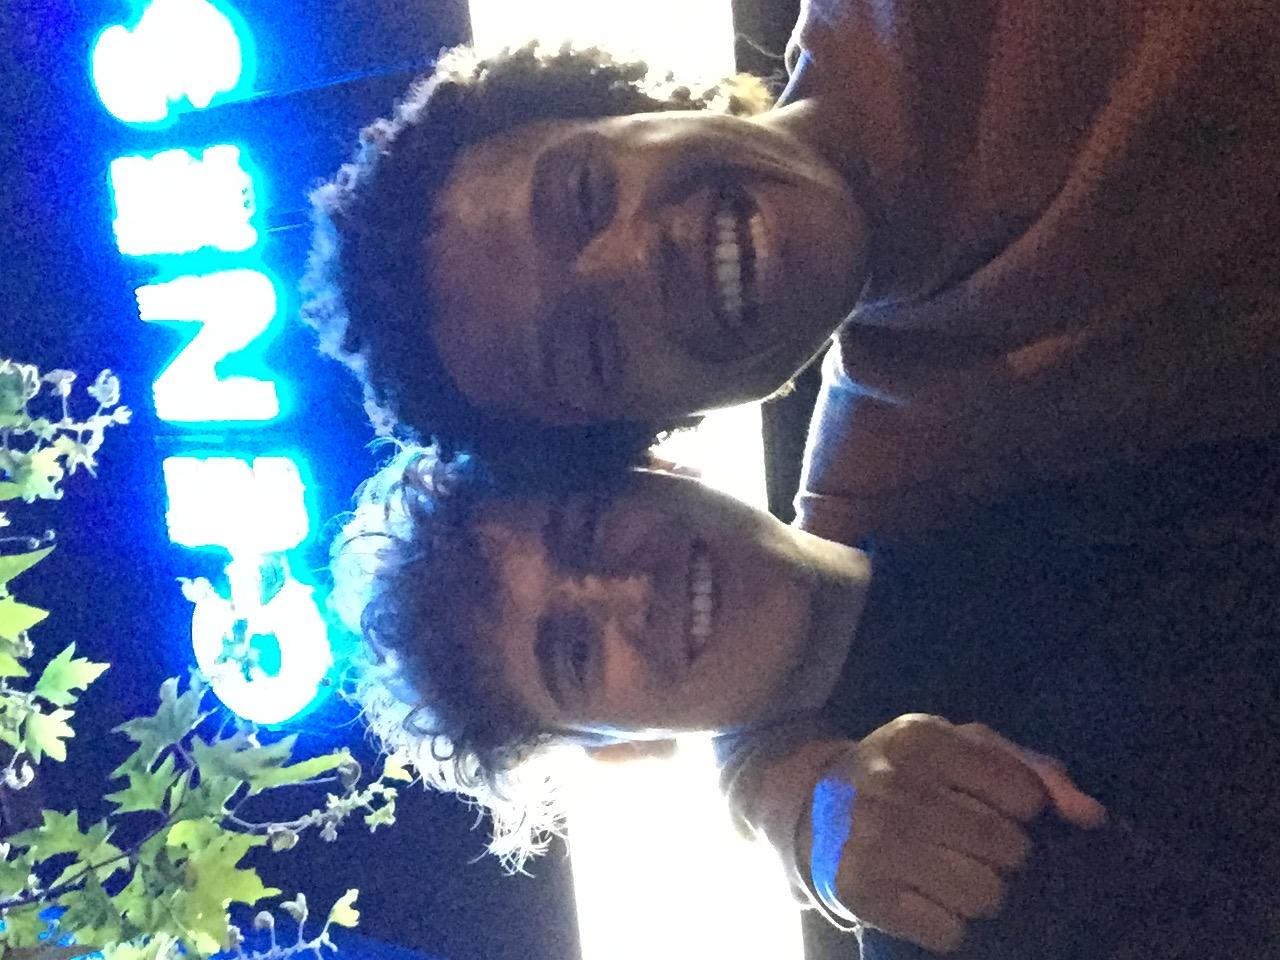 Jonathon with Percelle Ascott